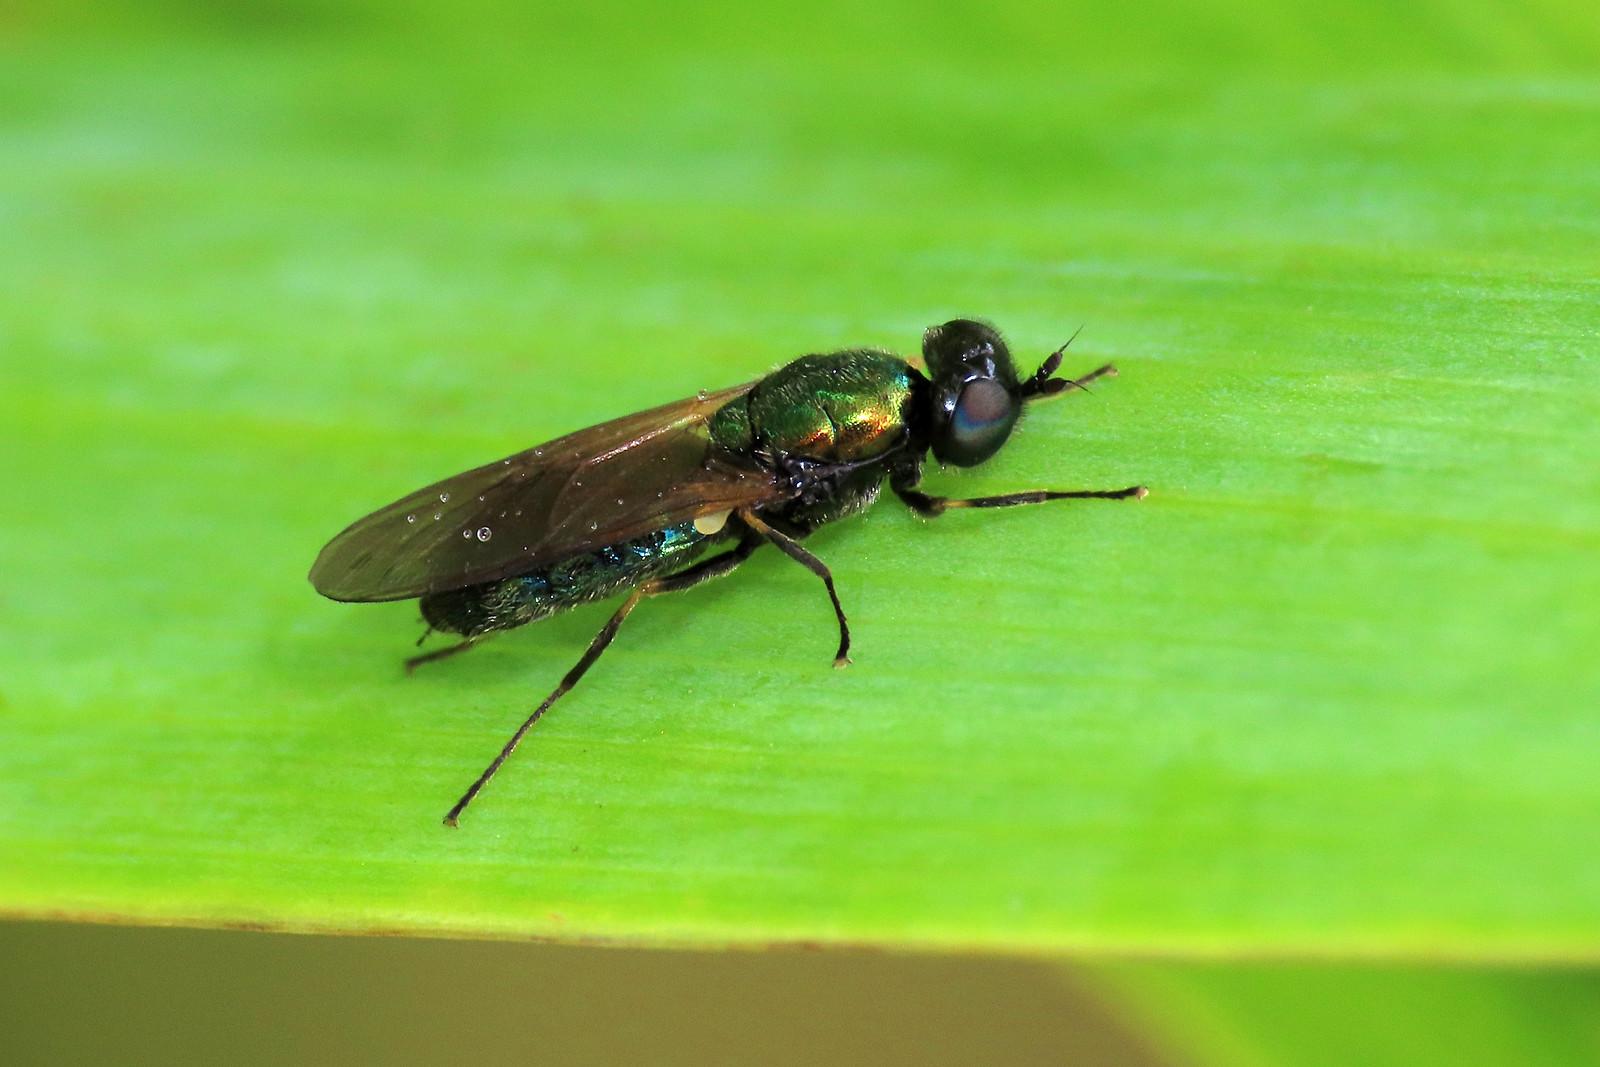 Chloromyia formosa - Broad Centurion